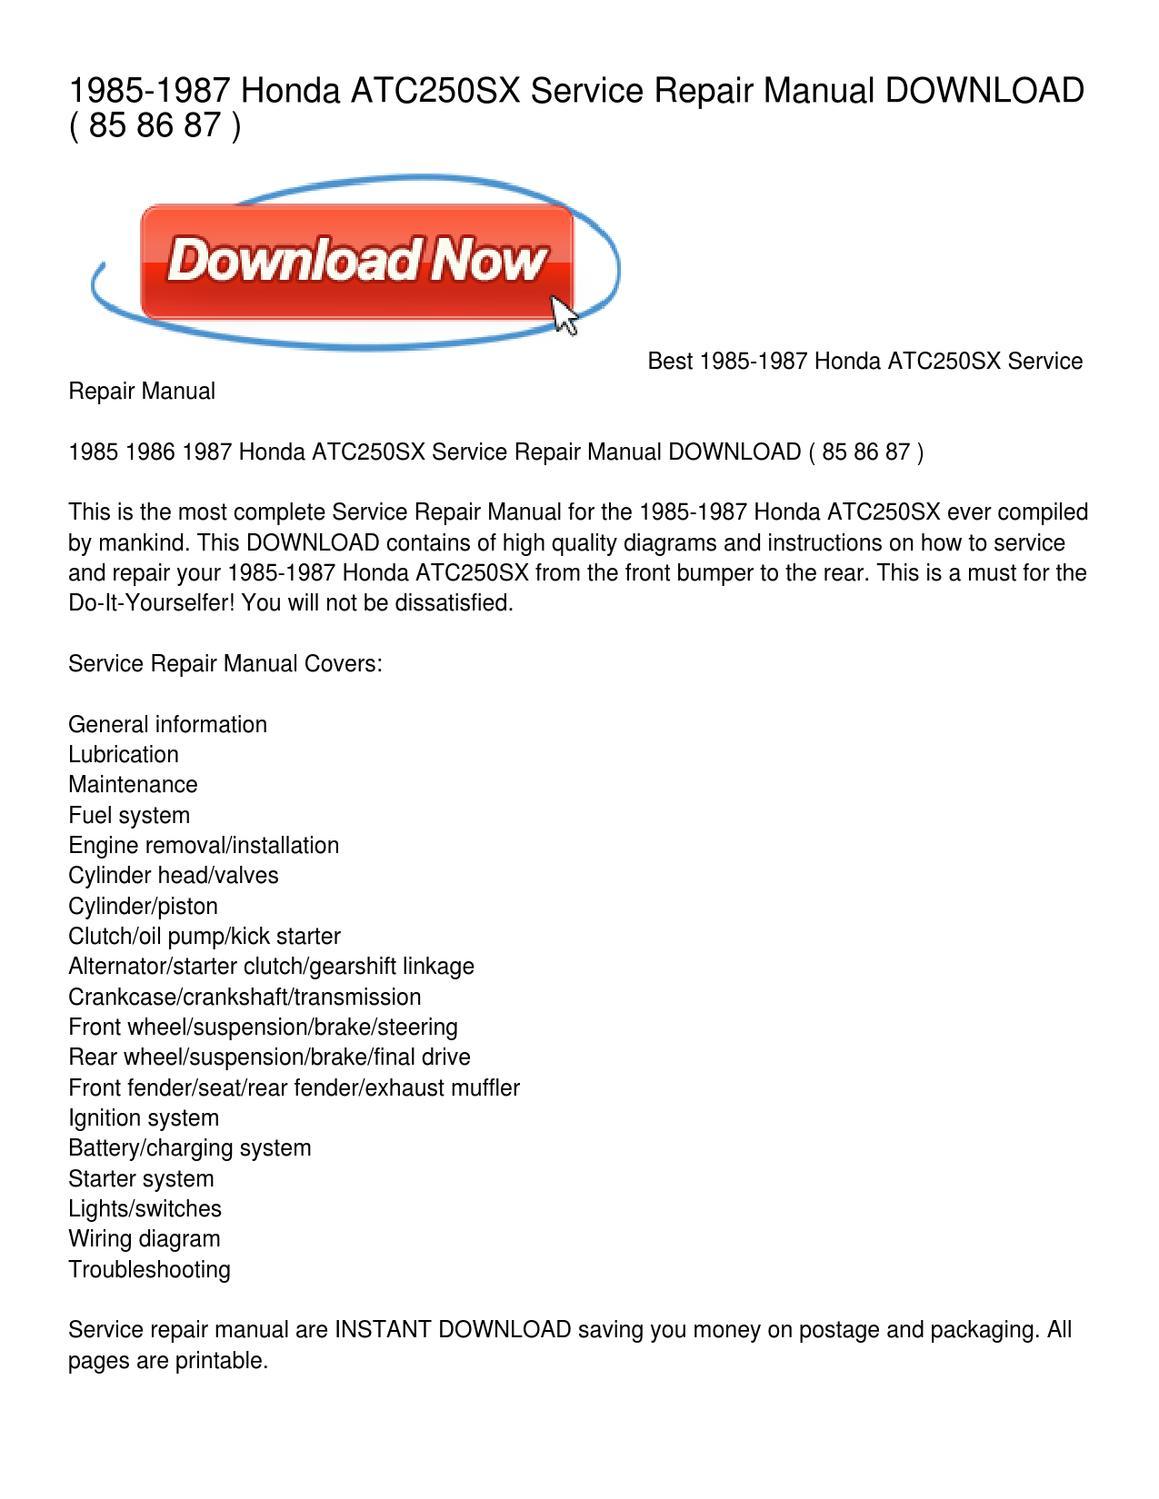 ... 1985 1987 Honda ATC250SX Service Repair Manual by Leonard Colmenero  issuu